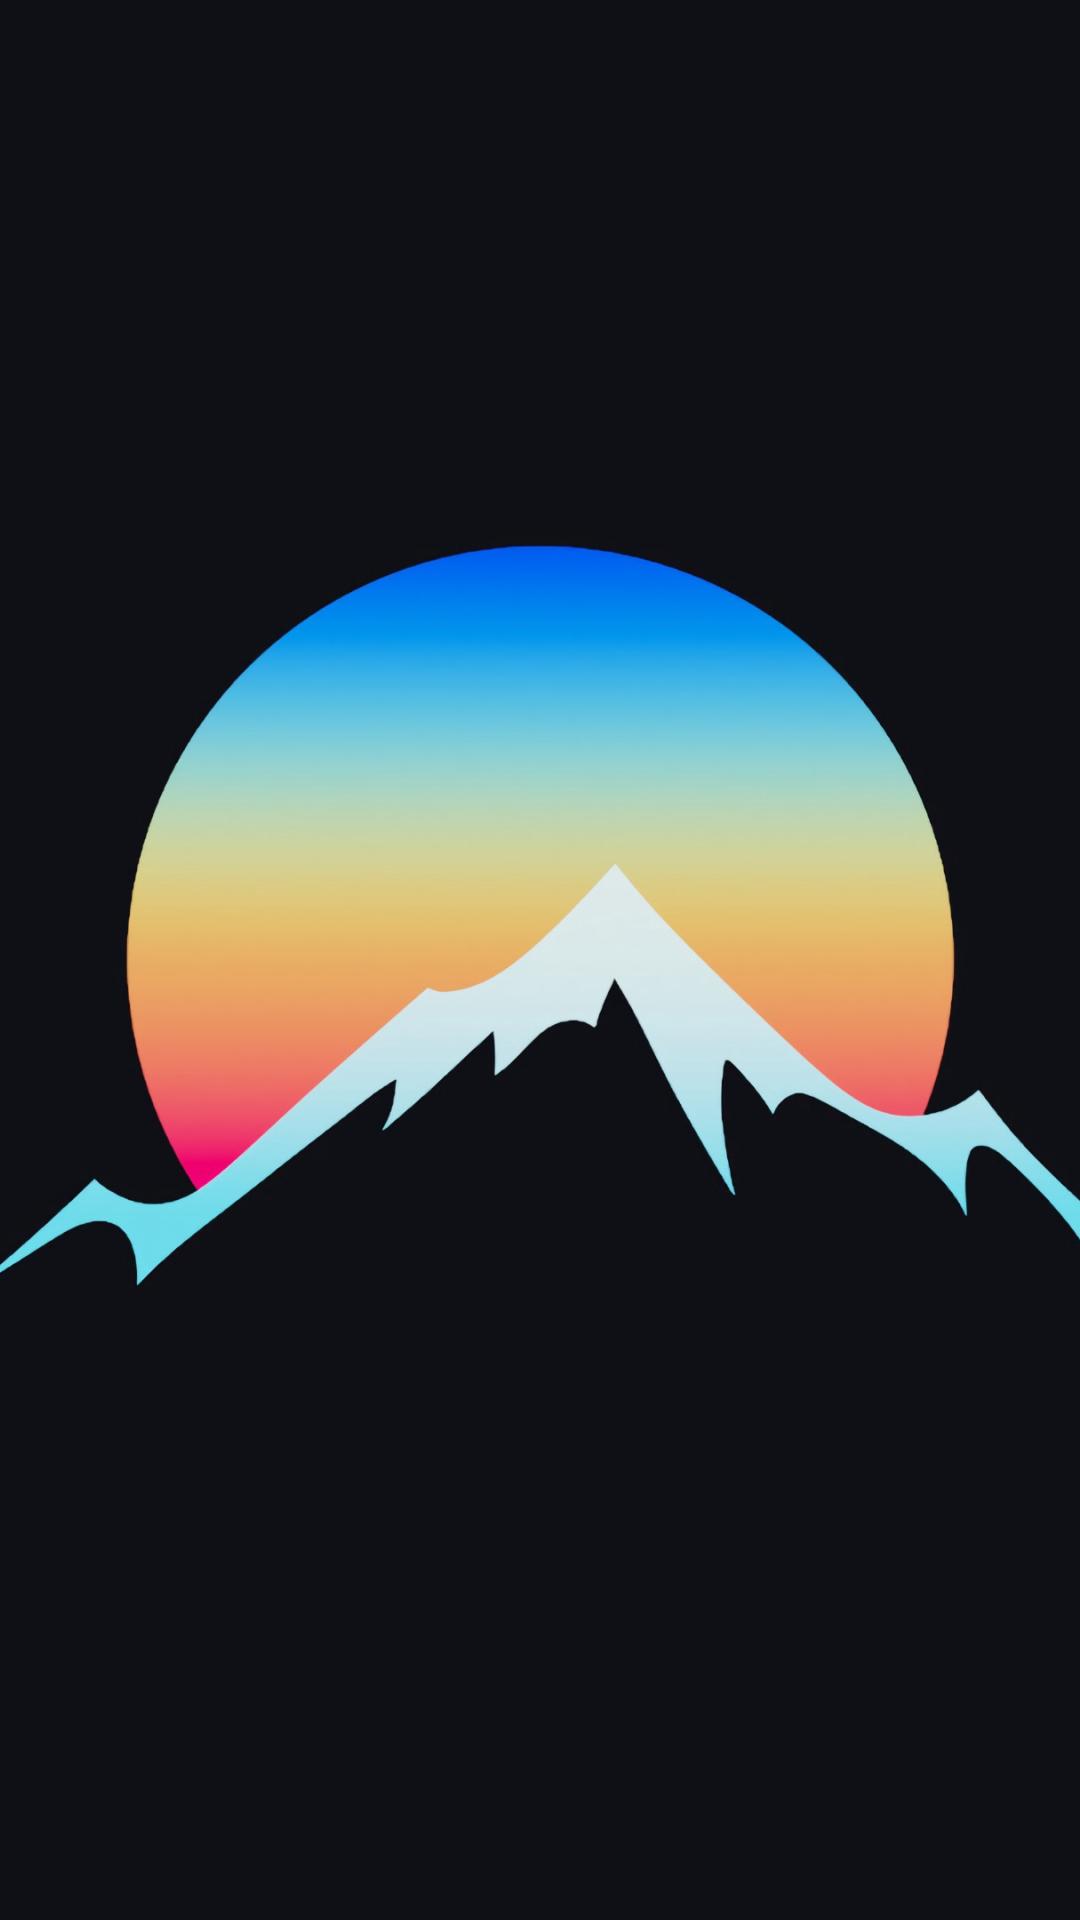 1080x1920 Minimalist Sunset In Hill Iphone 7, 6s, 6 Plus ...